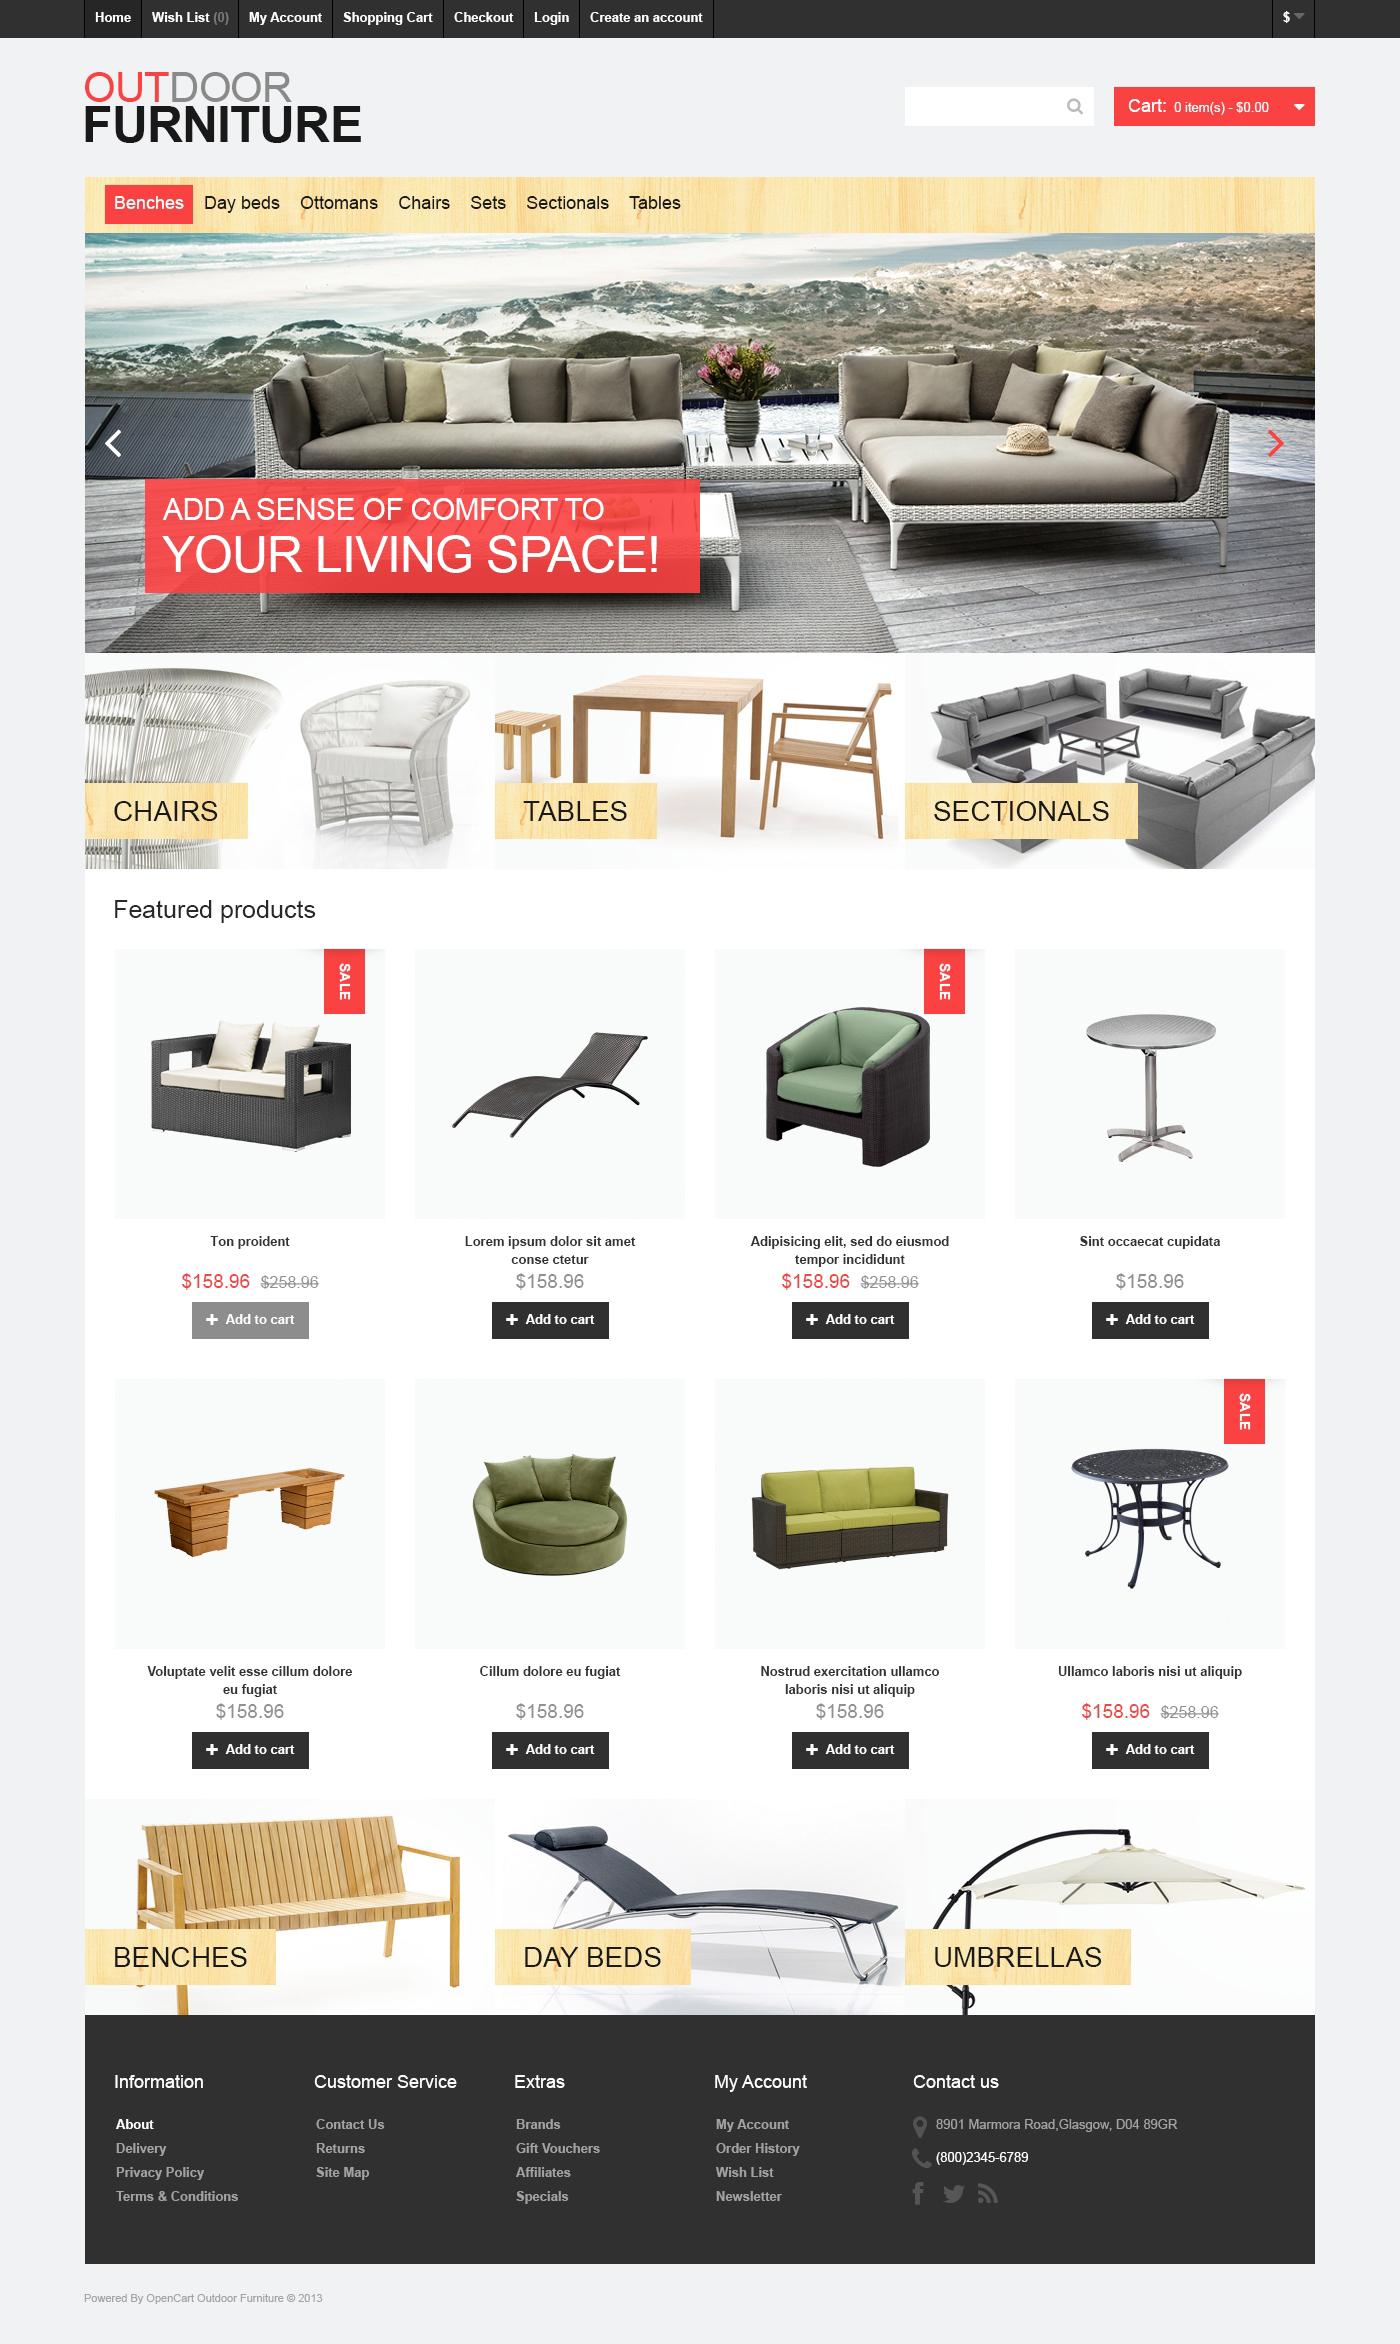 """Outdoor Furniture"" - OpenCart шаблон №46977 - скріншот"